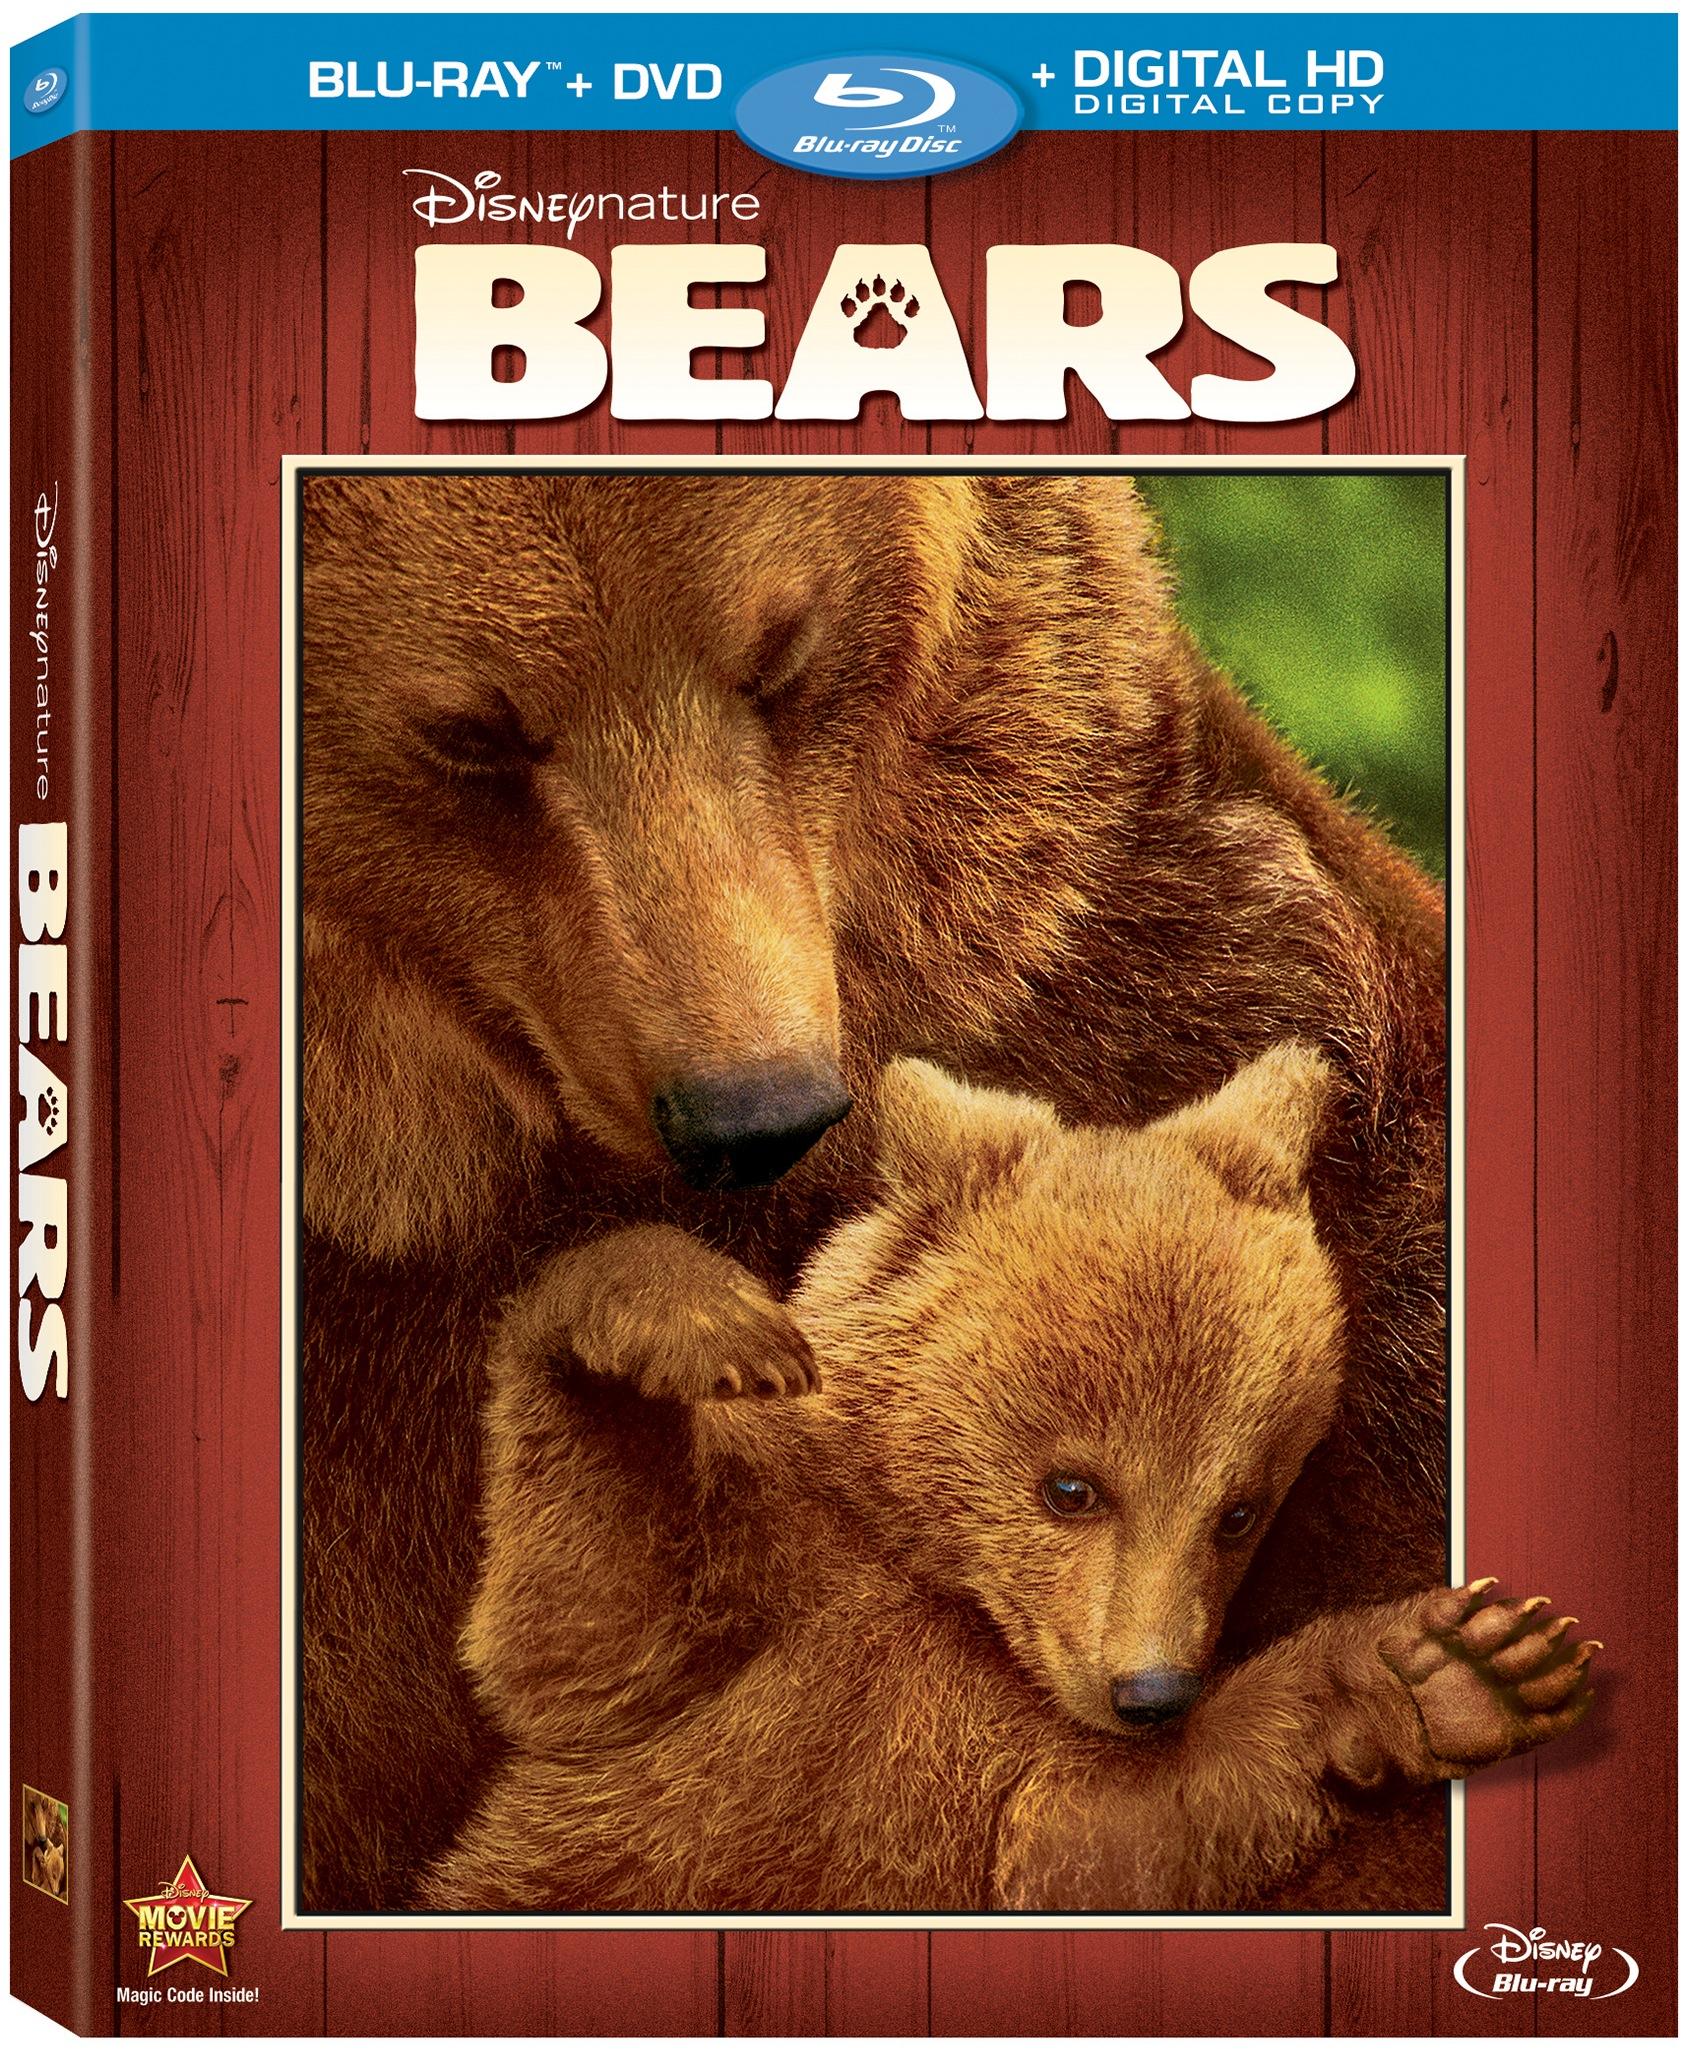 Disneynature Bears Blu Ray